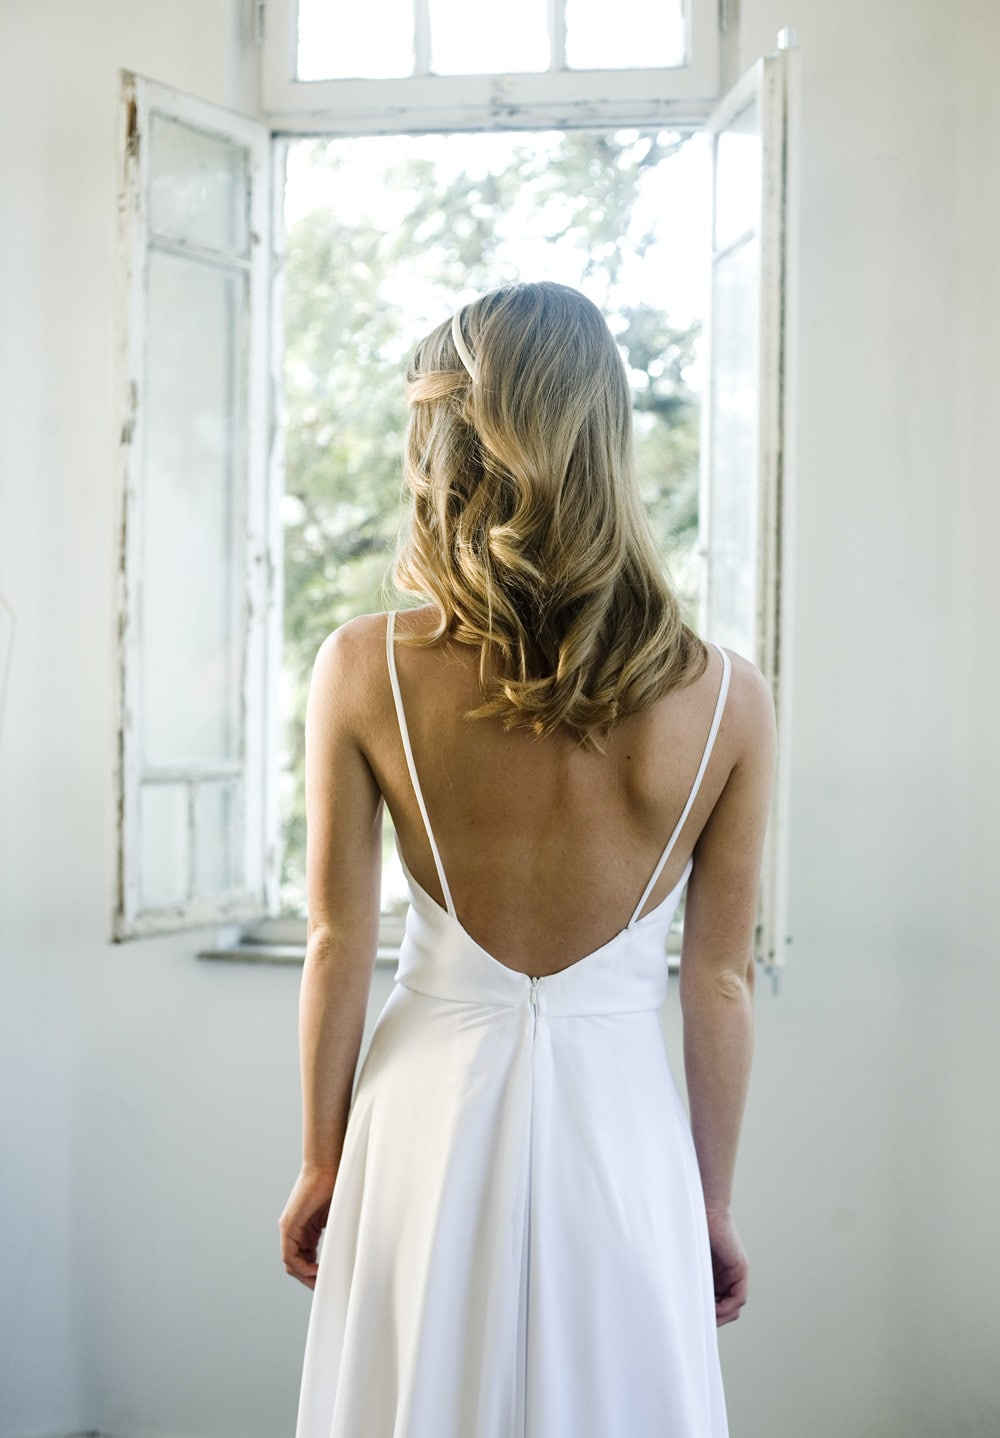 Sale romantic white chiffon beach wedding dress low back for Low back wedding dresses for sale